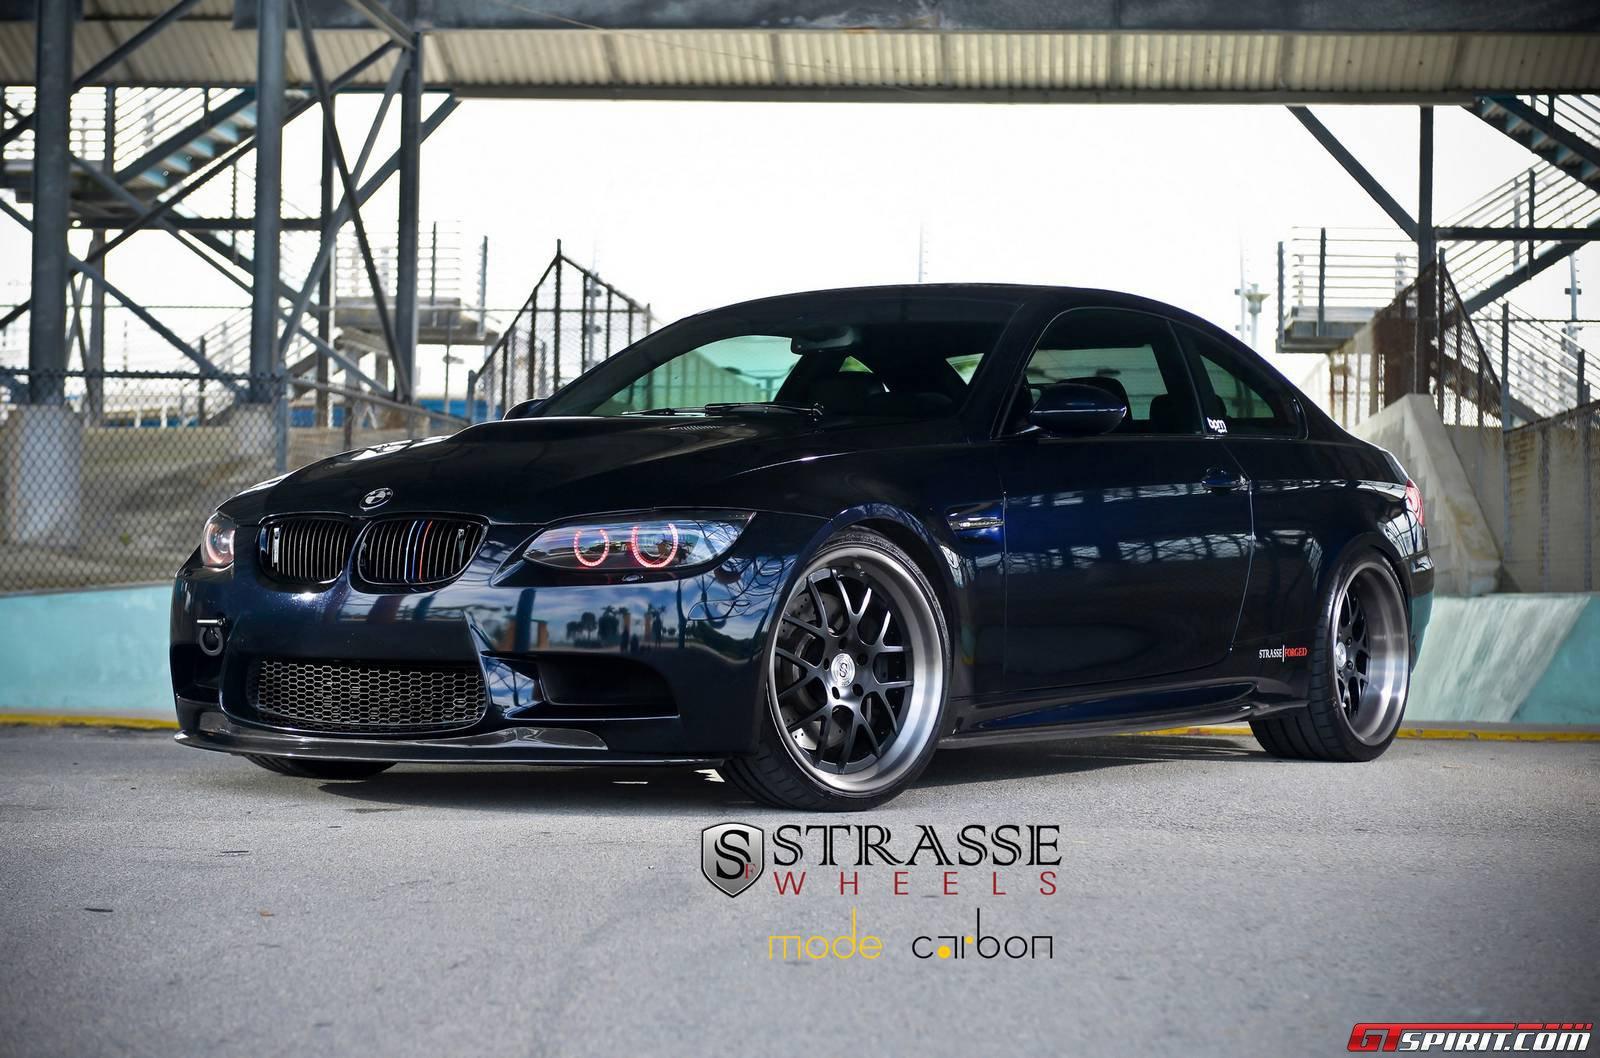 http://www.gtspirit.com/wp-content/gallery/strasse-wheels-bmw-m3/strasse-wheels-bmw-e92-m3-performance-series-sm7-step-lip-2.jpg